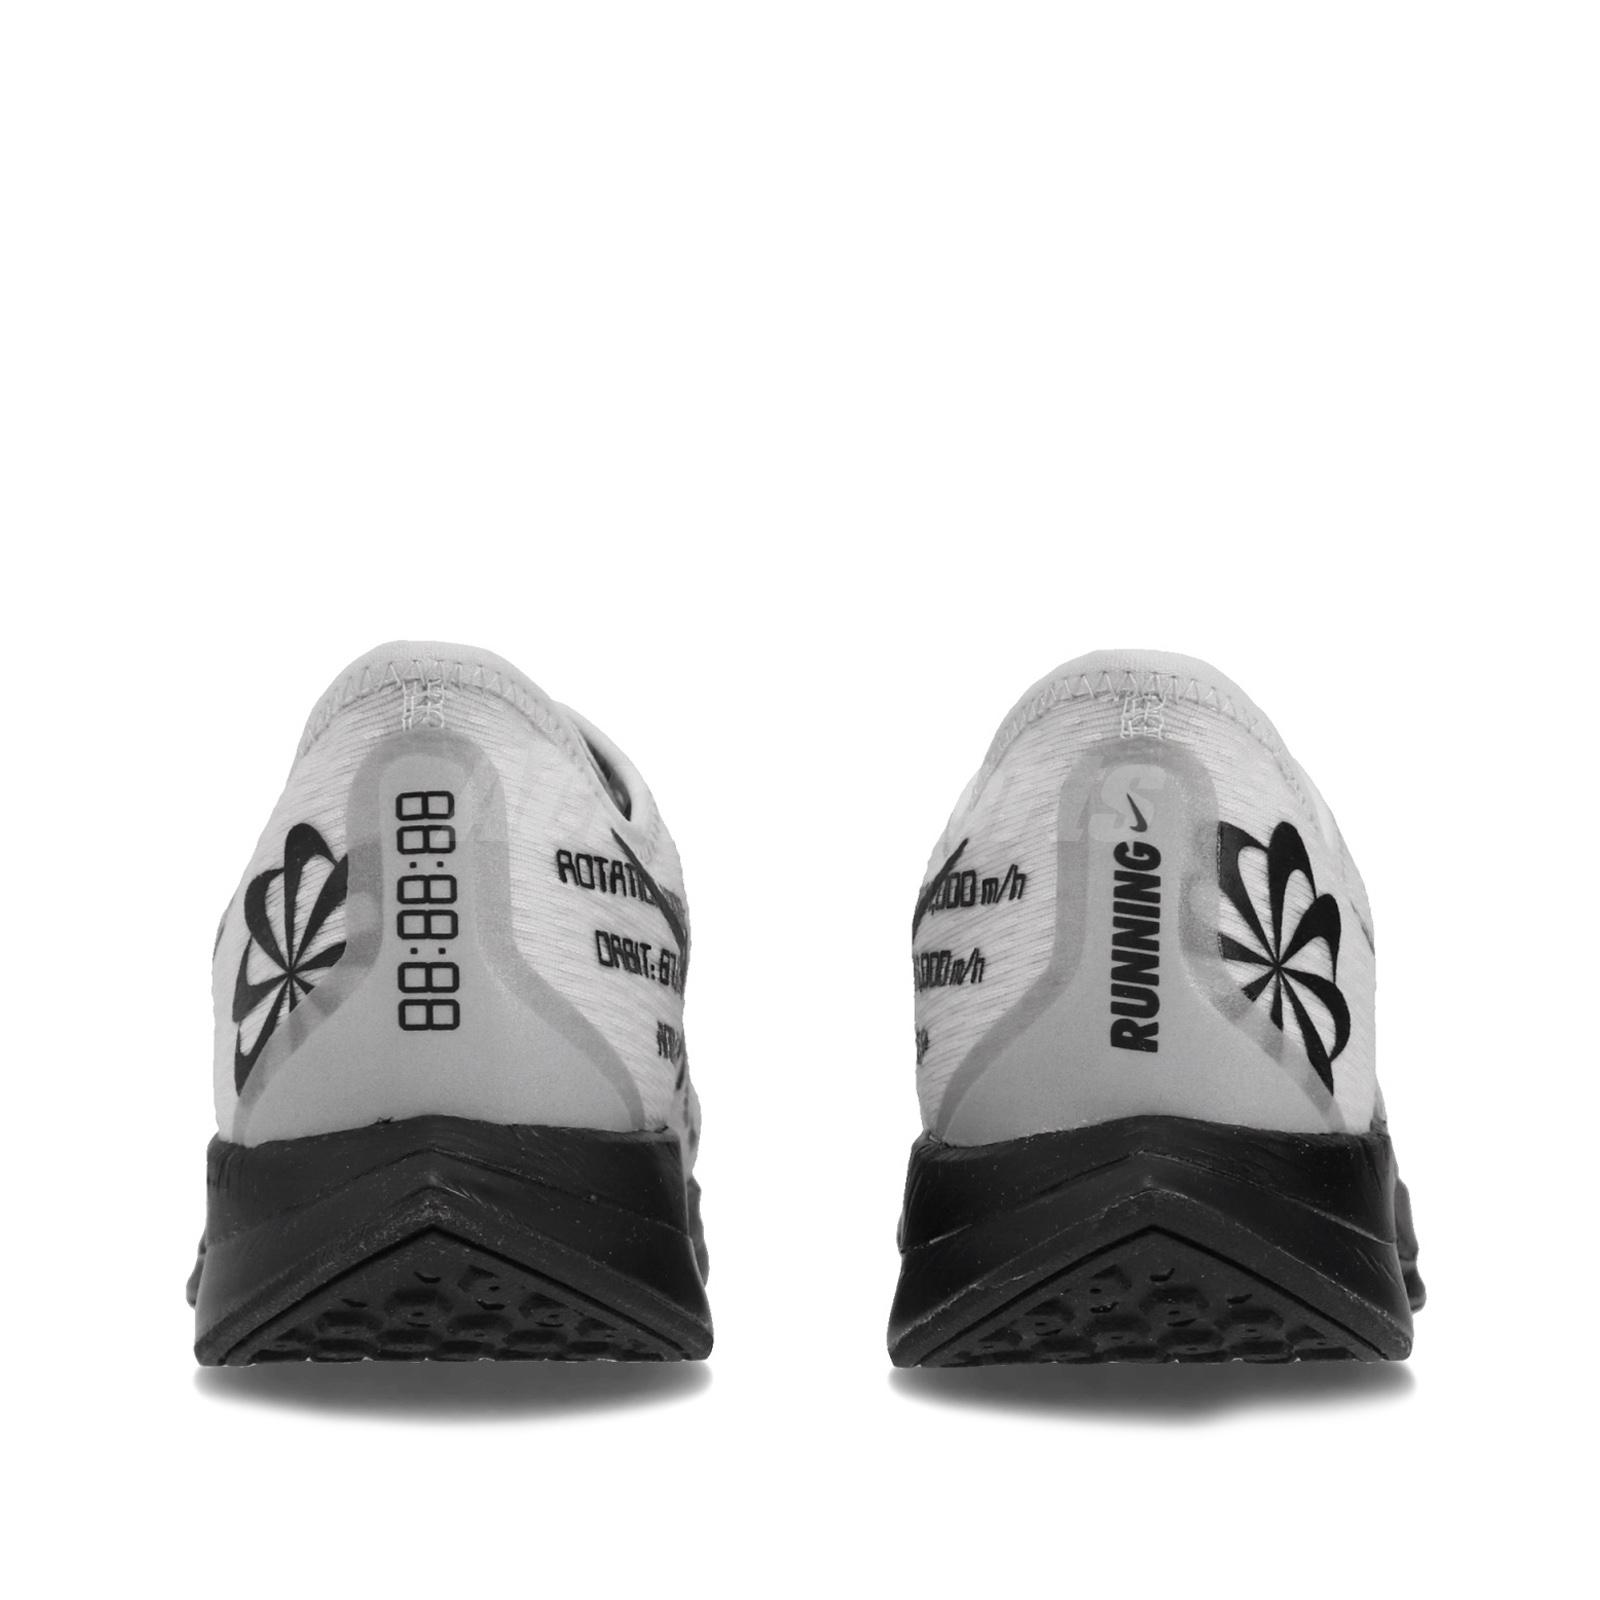 Detalles acerca de Nike Zoom Pegasus Turbo 2 Platino Pura Raza Negra para  Hombre Zapatillas Para Correr CV3051-001- mostrar título original